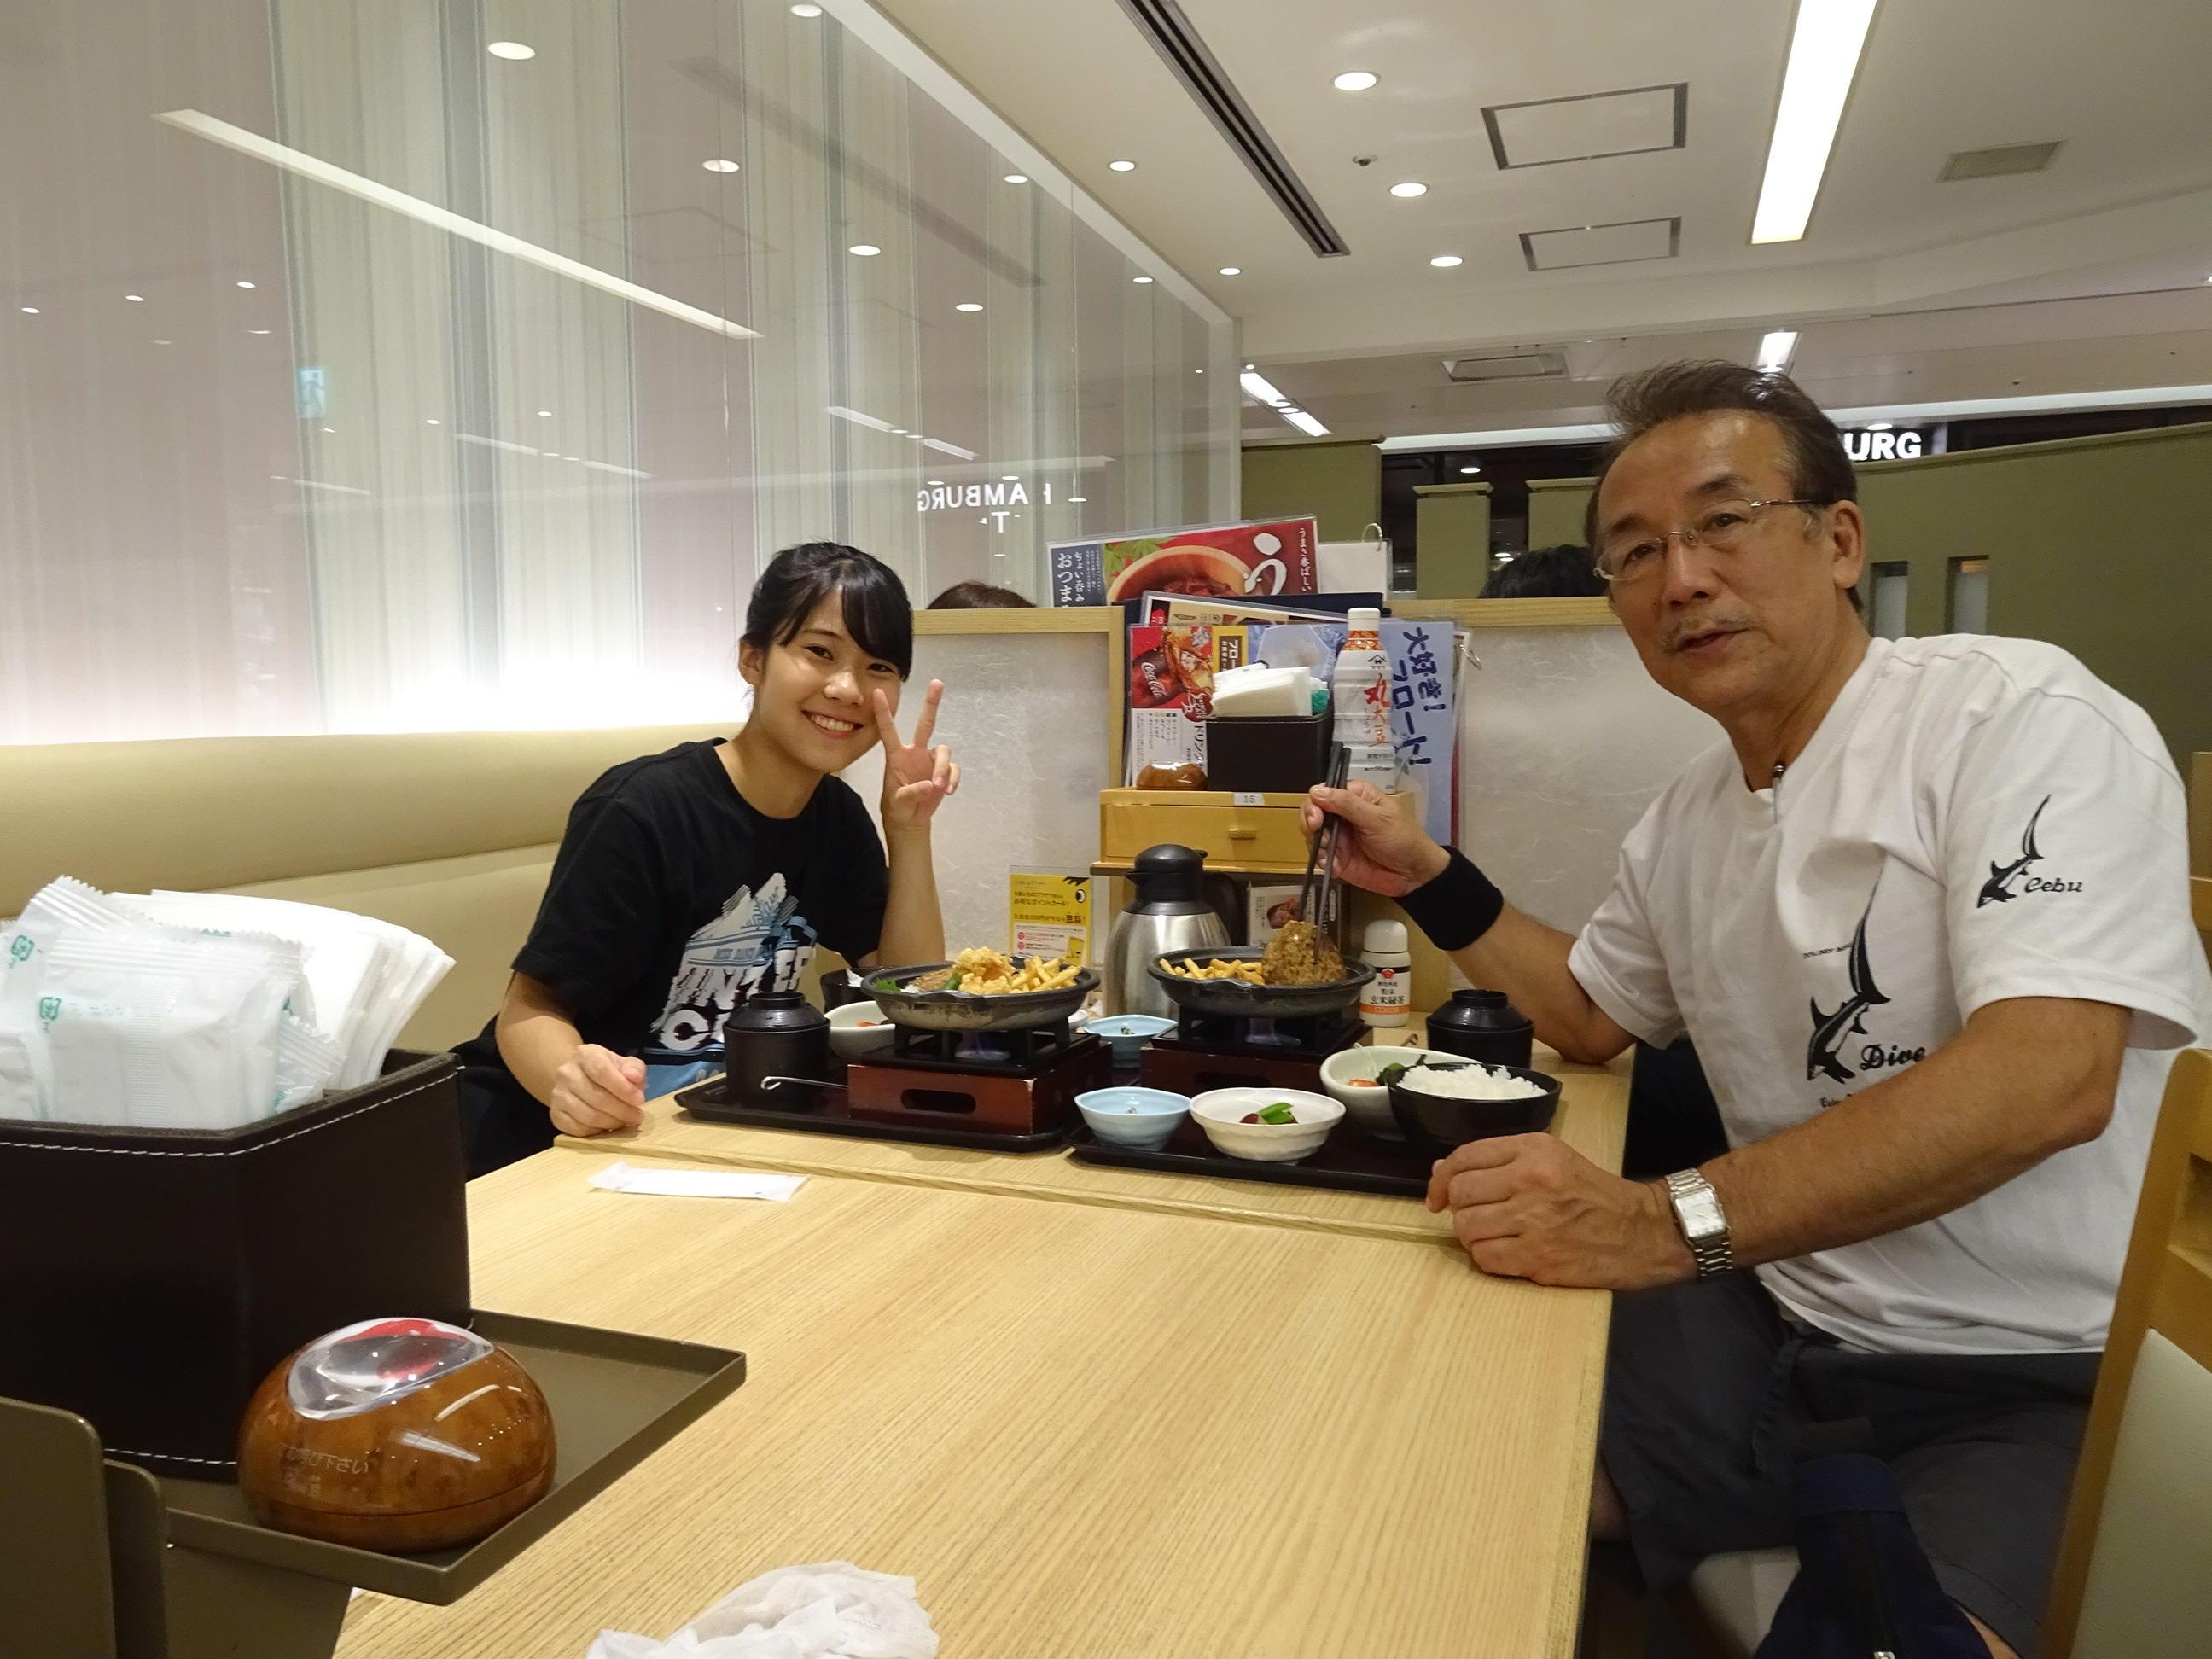 180731 To Osaka (30).JPG